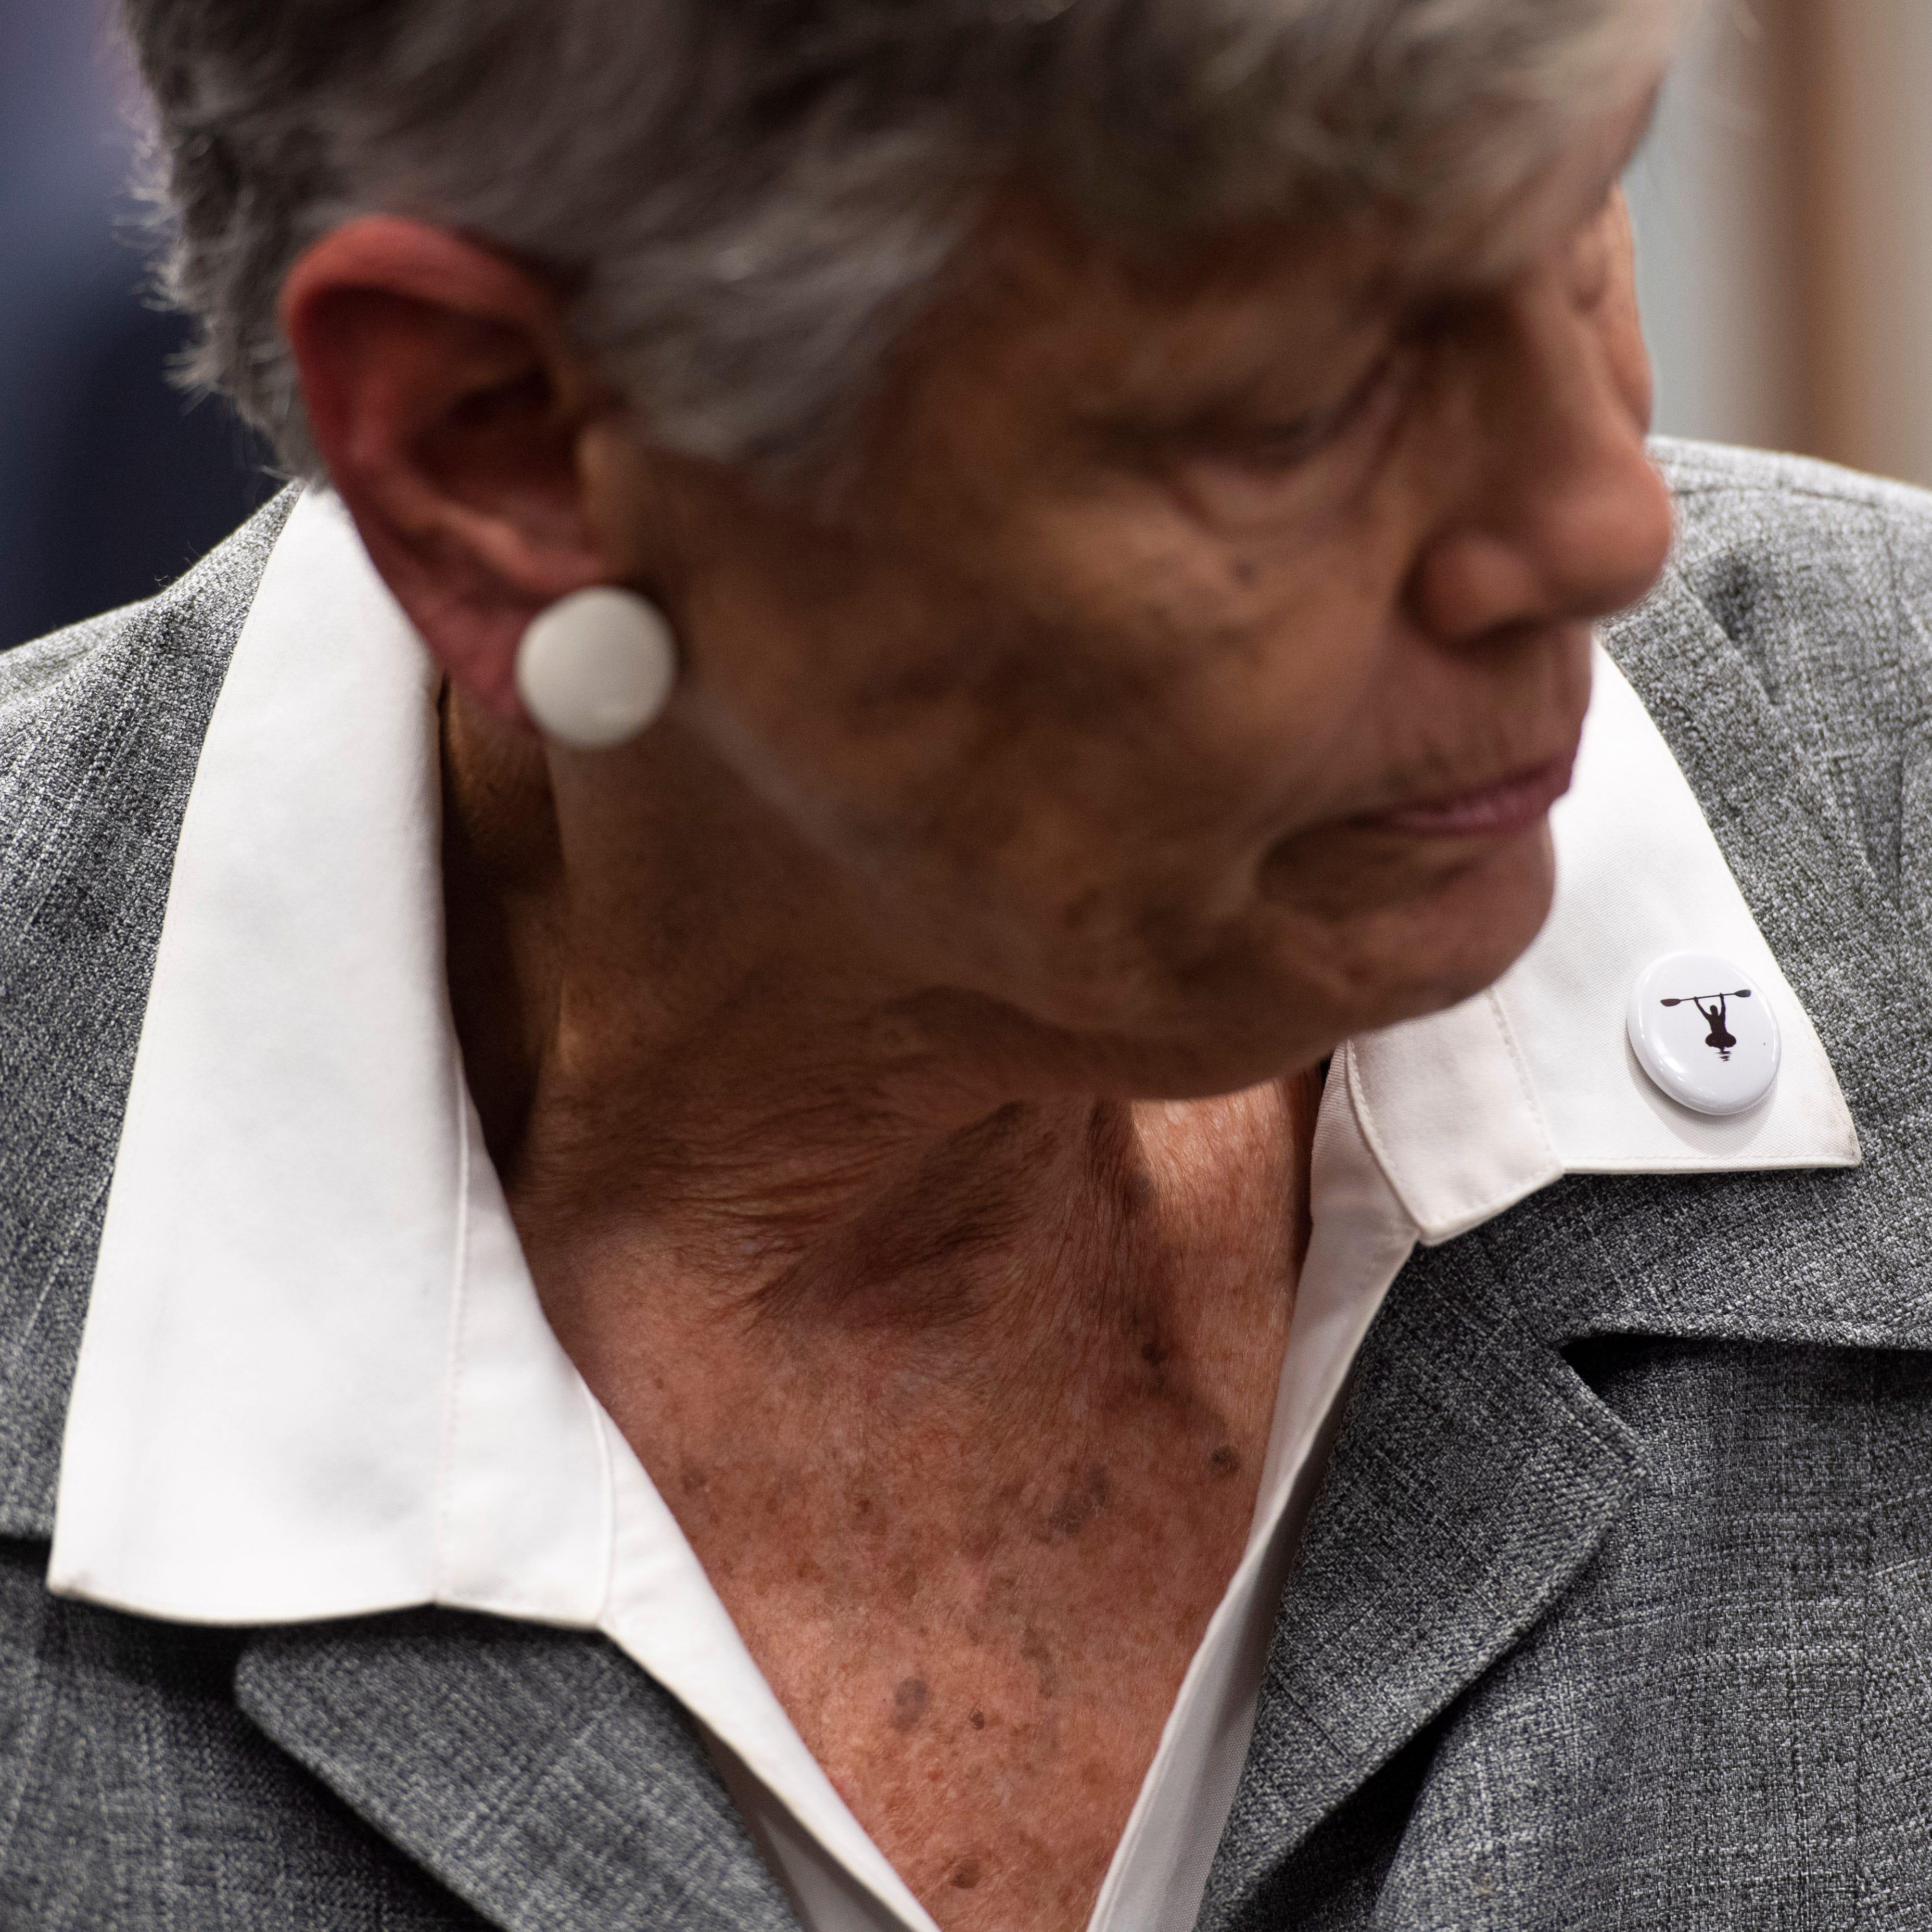 Appeals court hears environmentalist Maggy Hurchalla contest $4.4 million Lake Point verdict